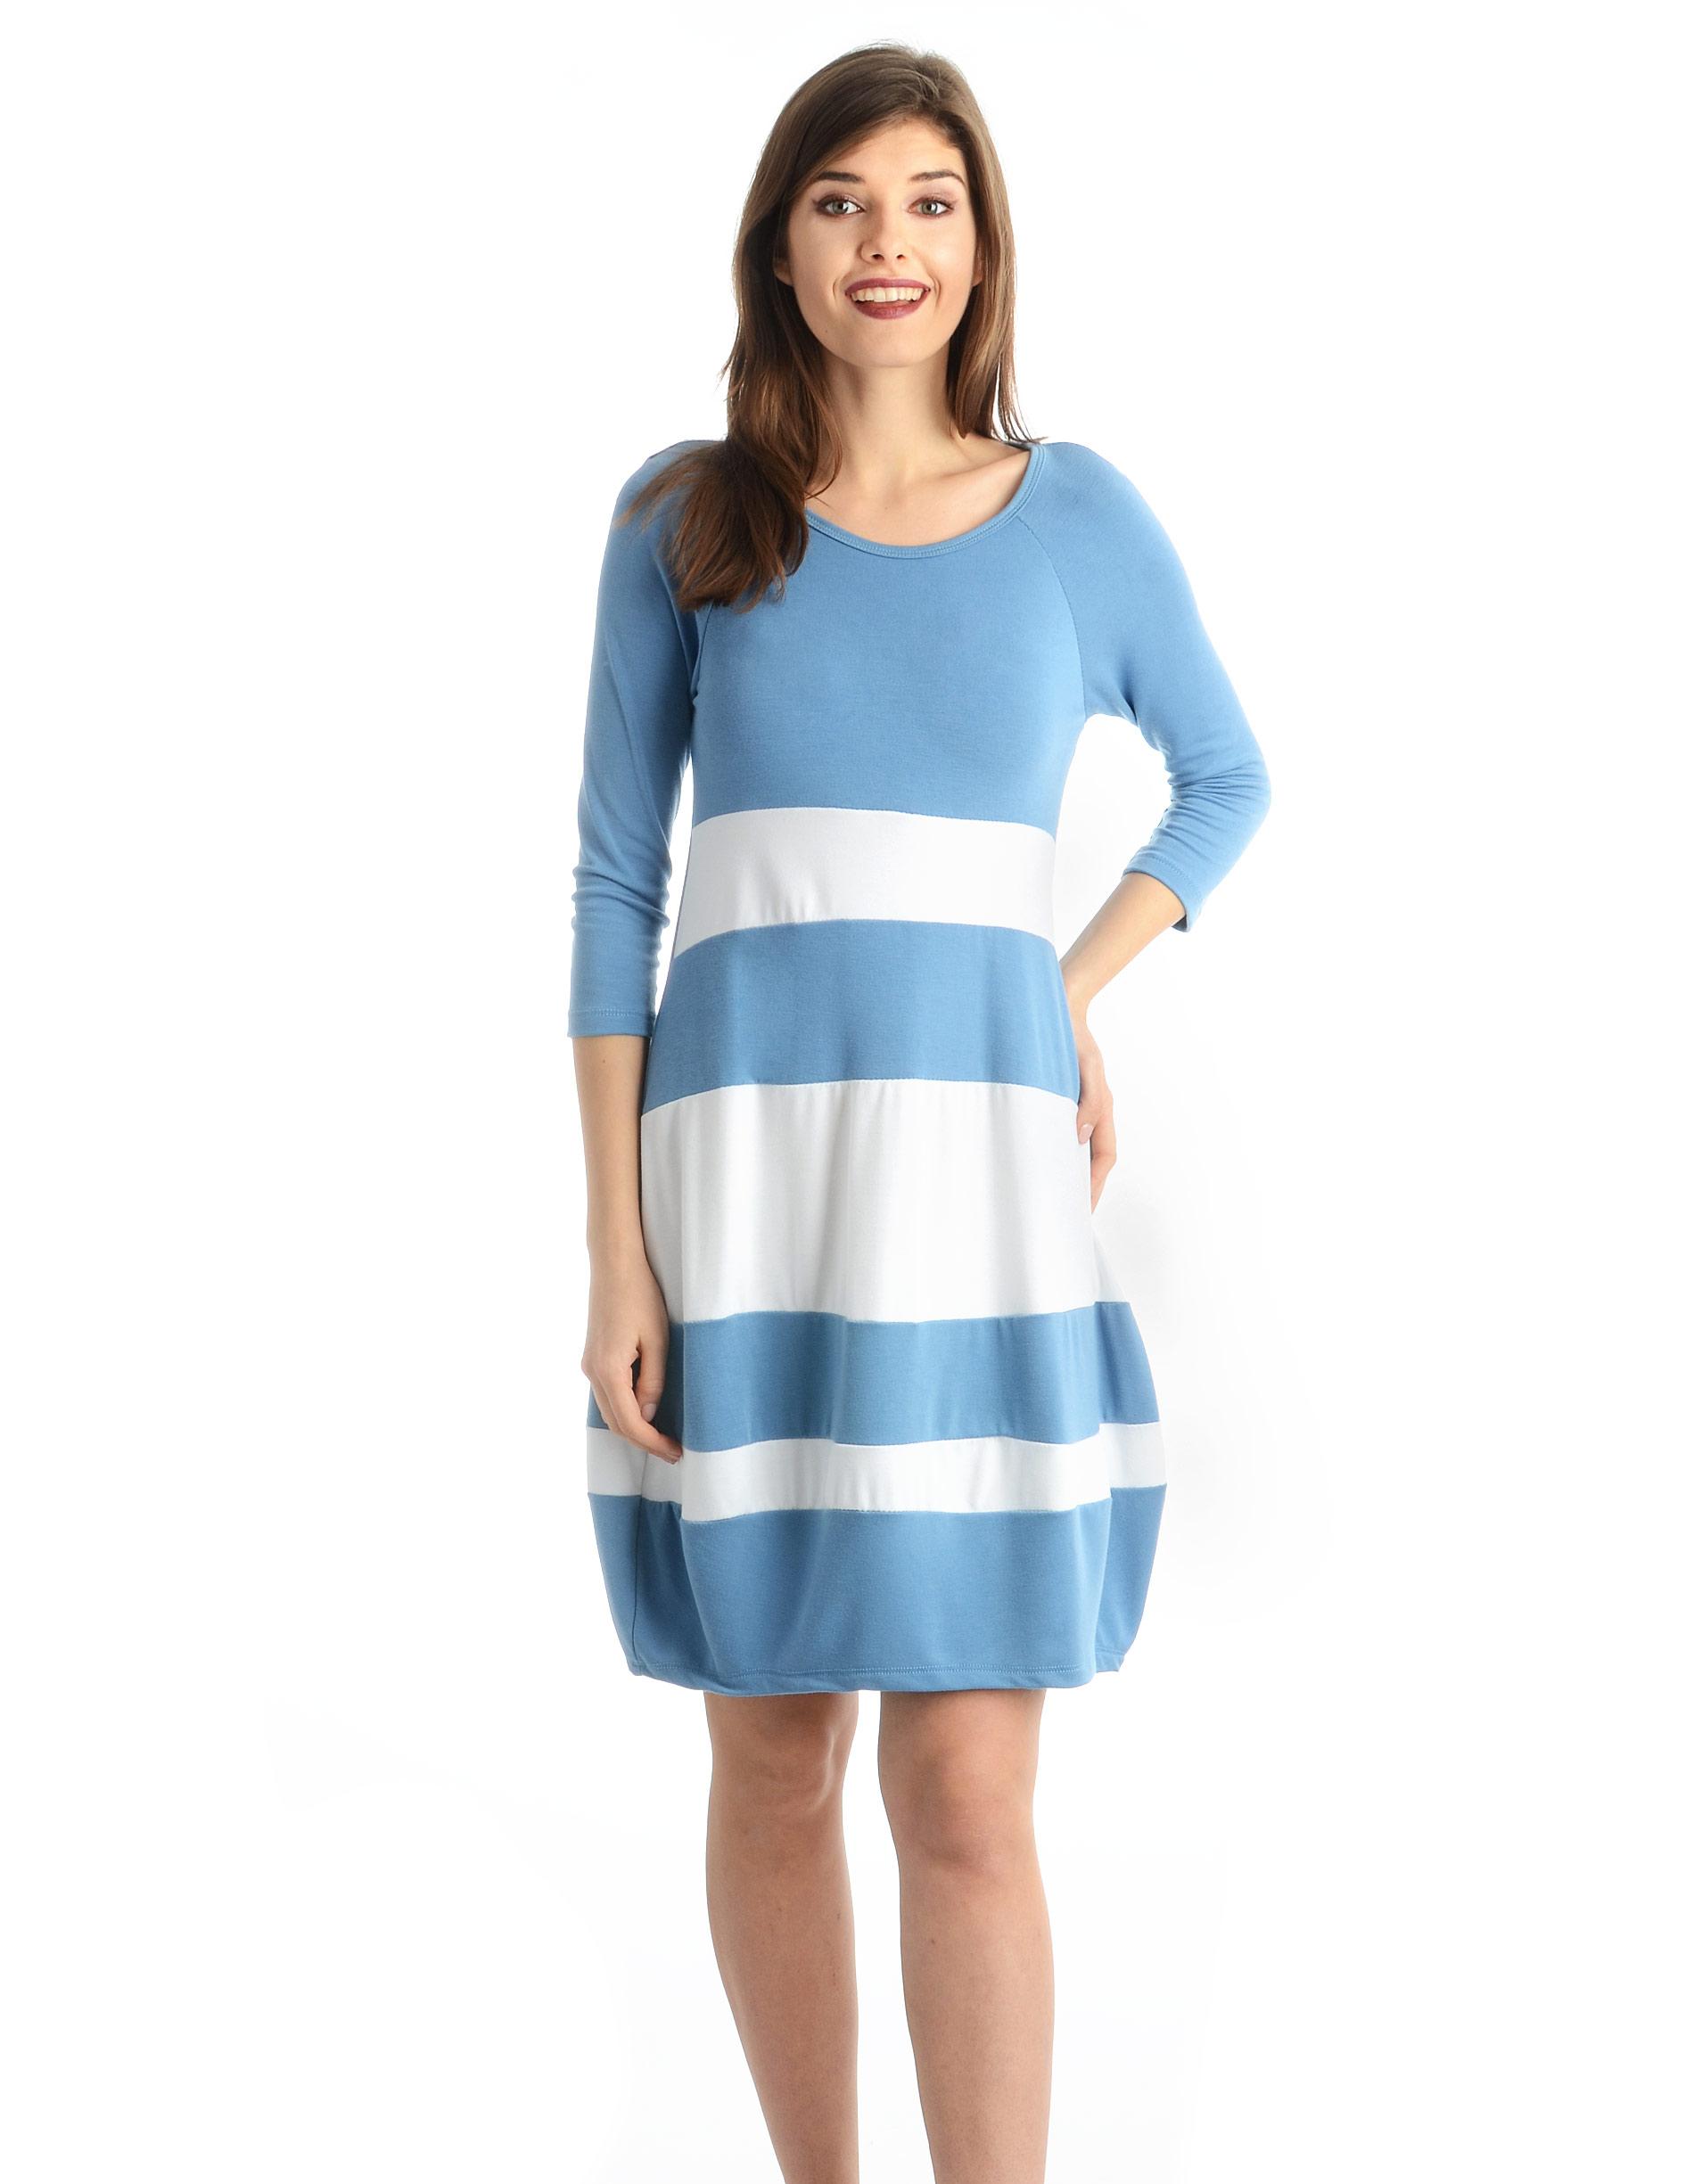 Sukienka - 62-5035 JEANS - Unisono